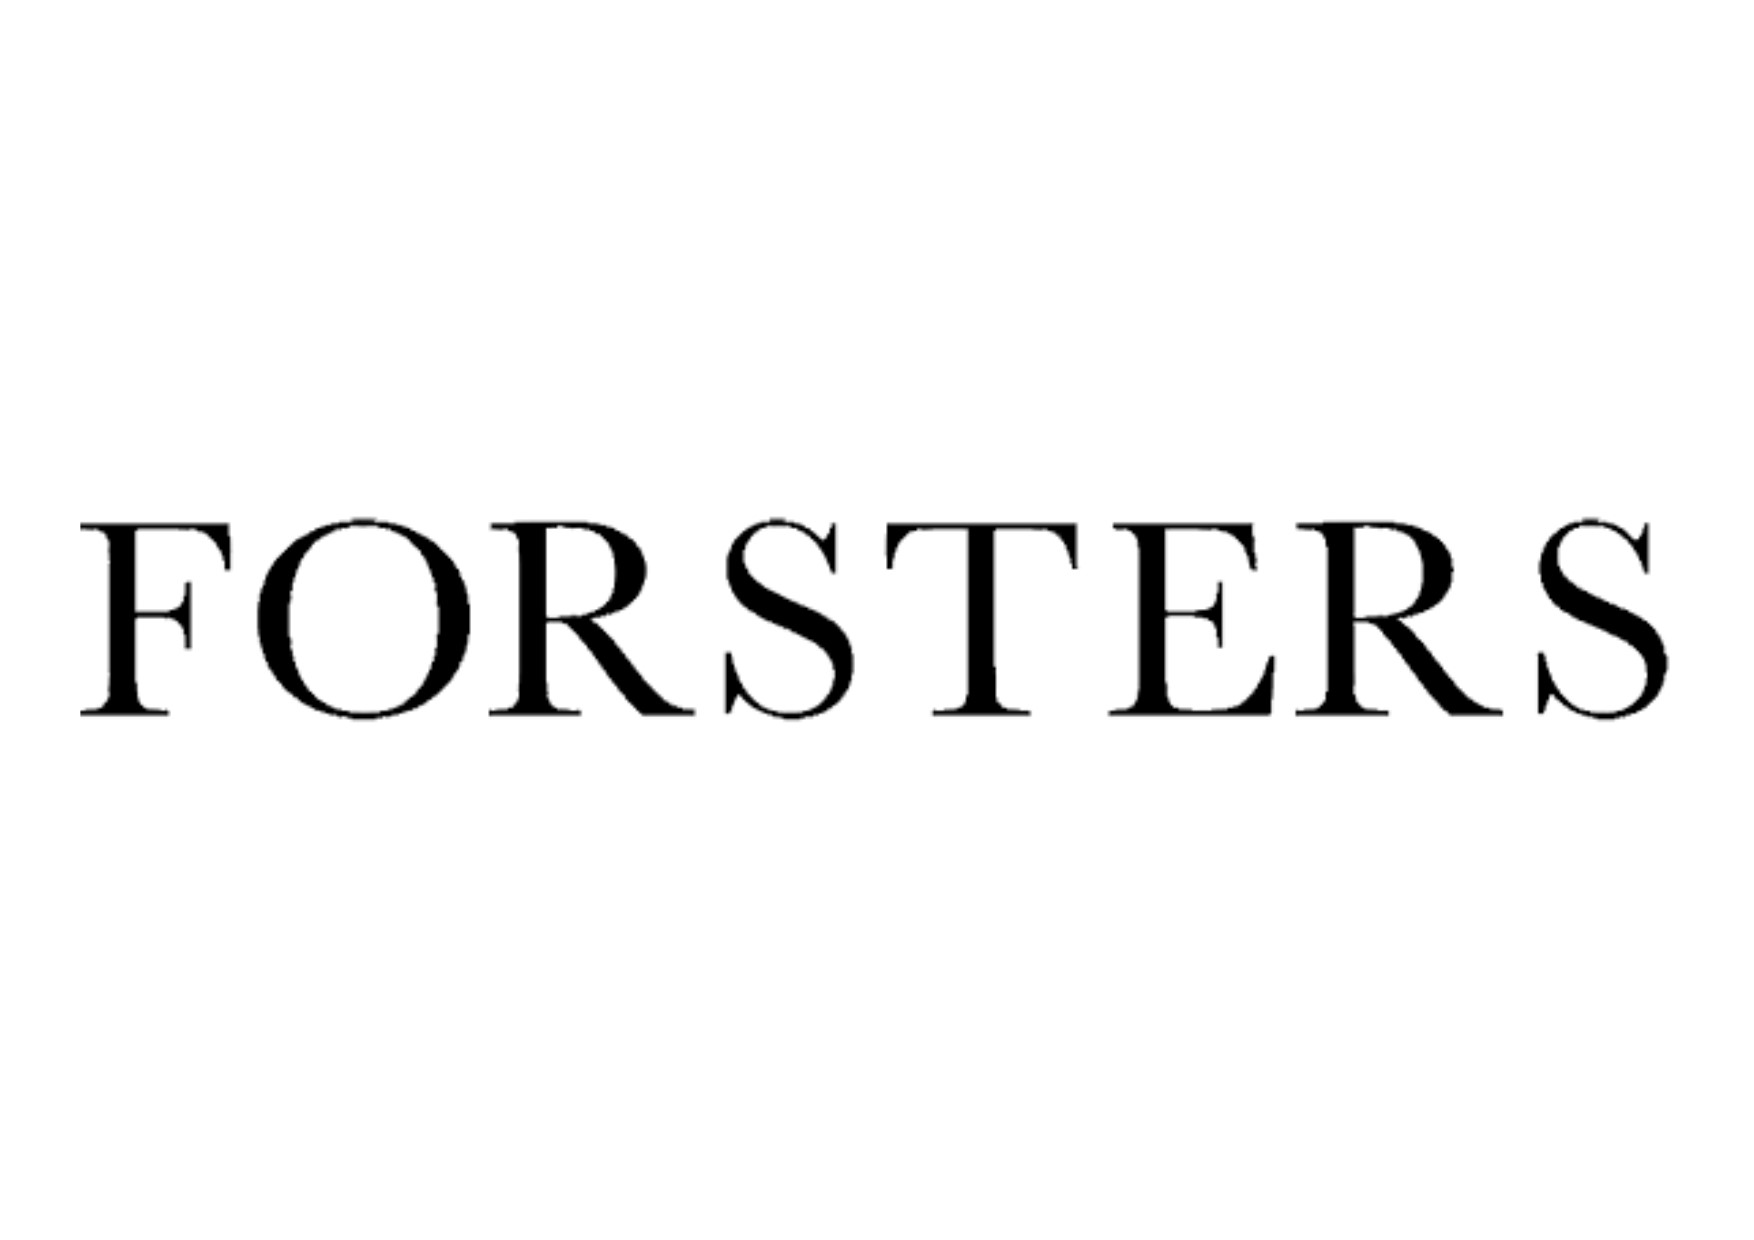 Forsters Appoints Former Harbottle Amp Lewis Interim It